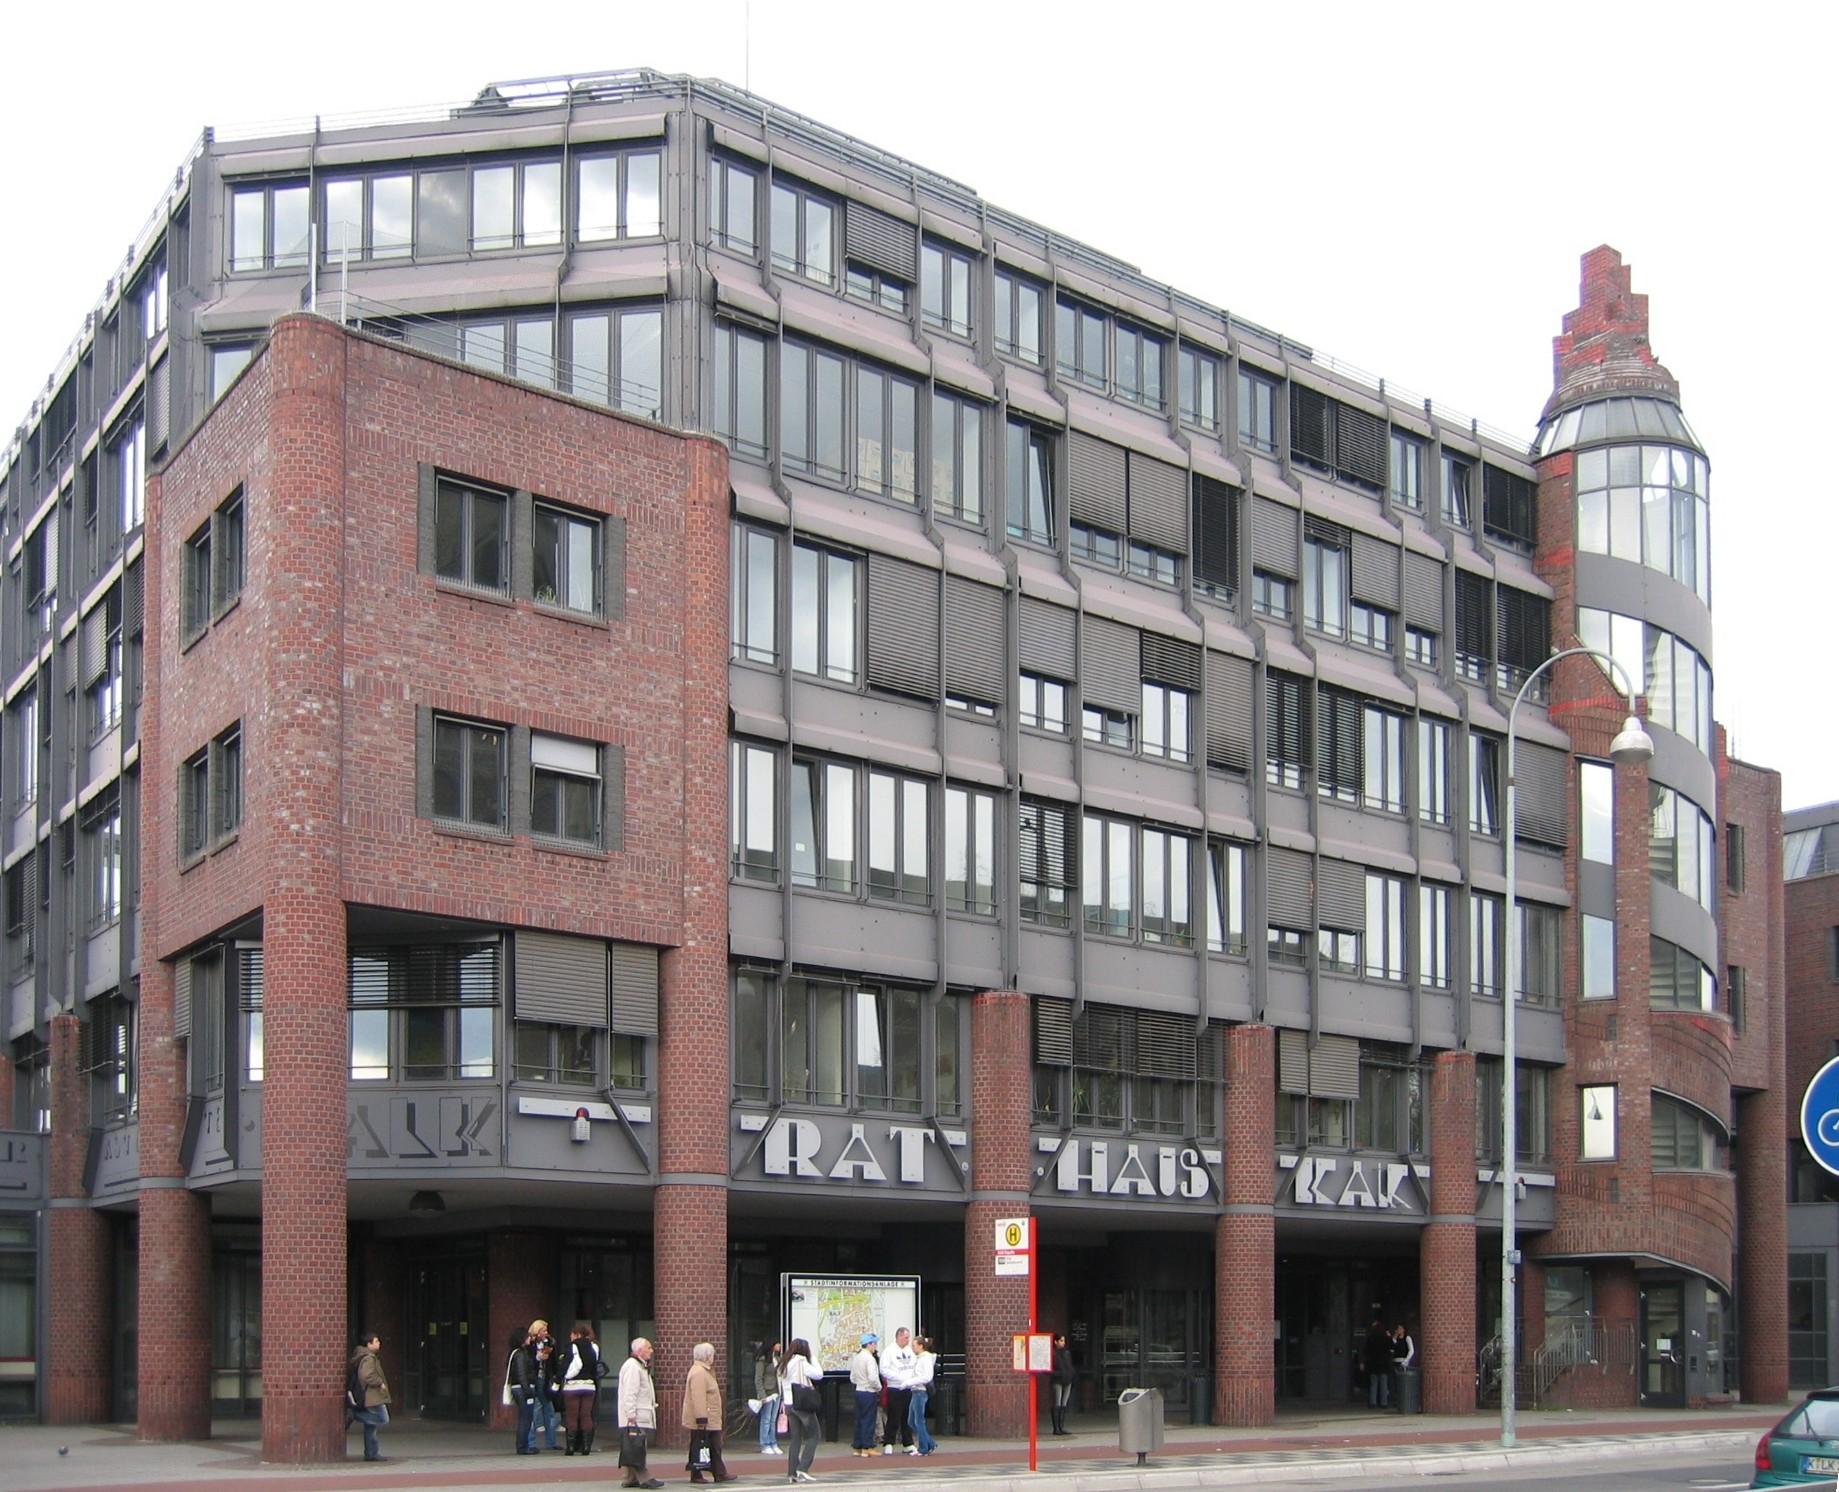 Bezirksrathaus Köln Innenstadt